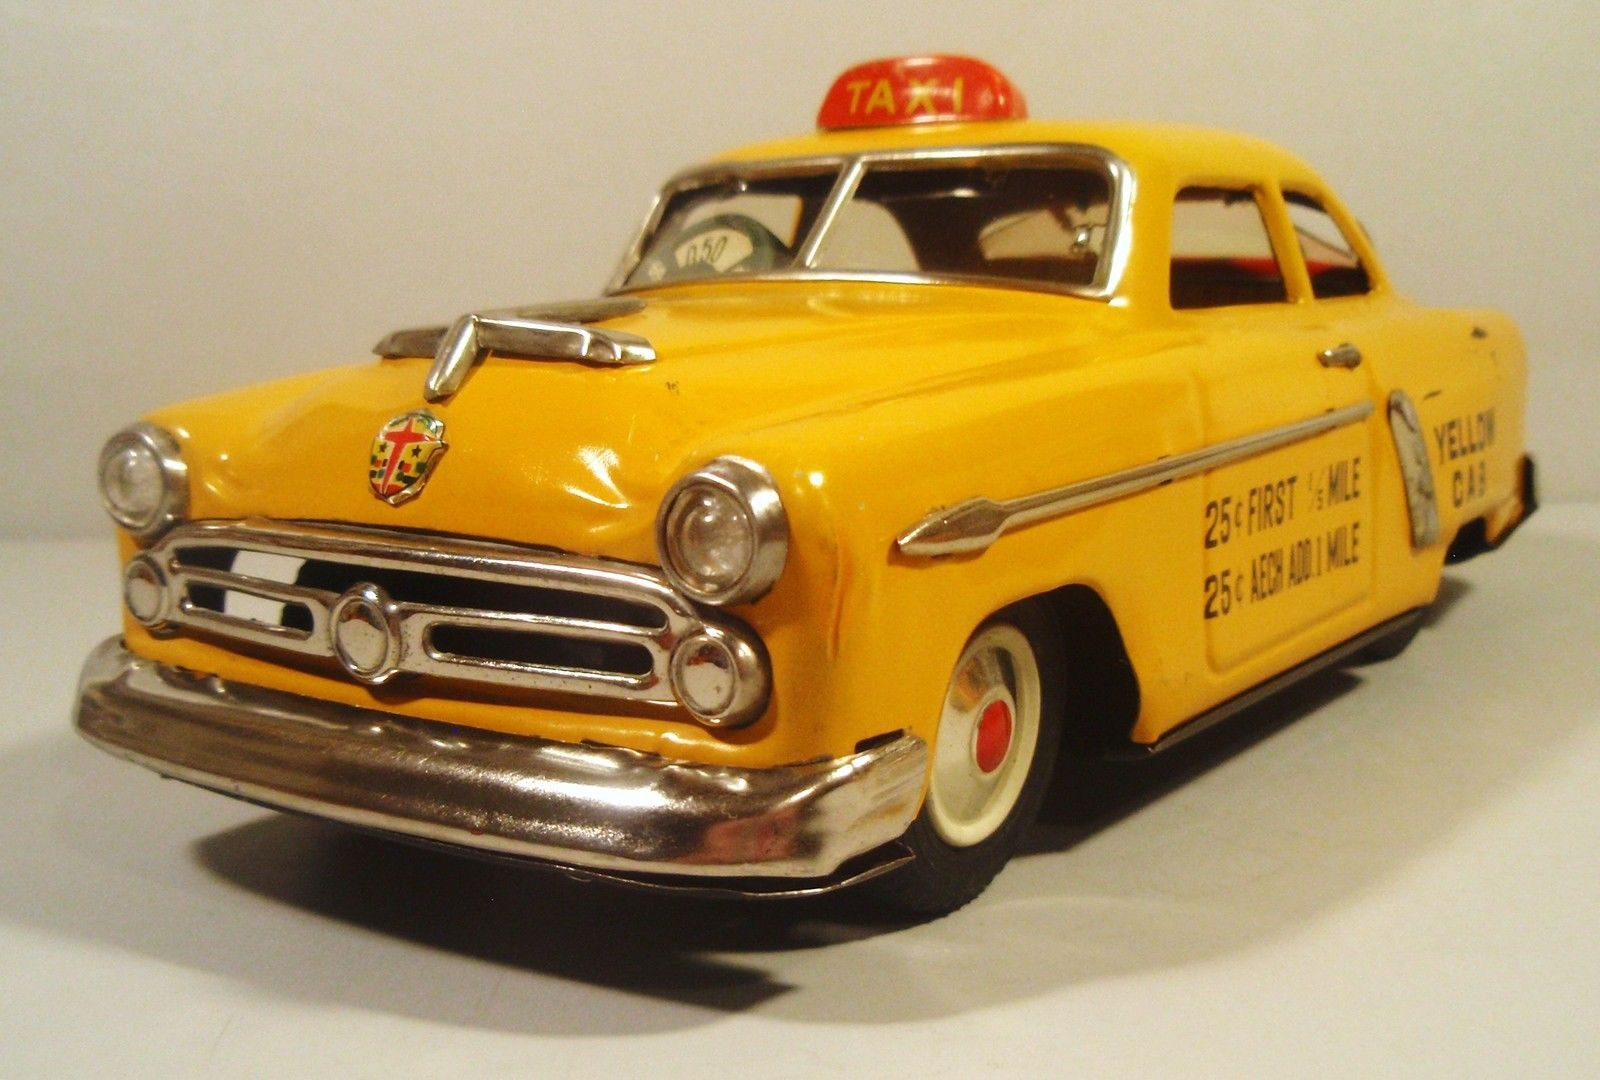 Tin Friction 1952 Ford Mercury Taxi Cab Car w Meter Marusan Japan